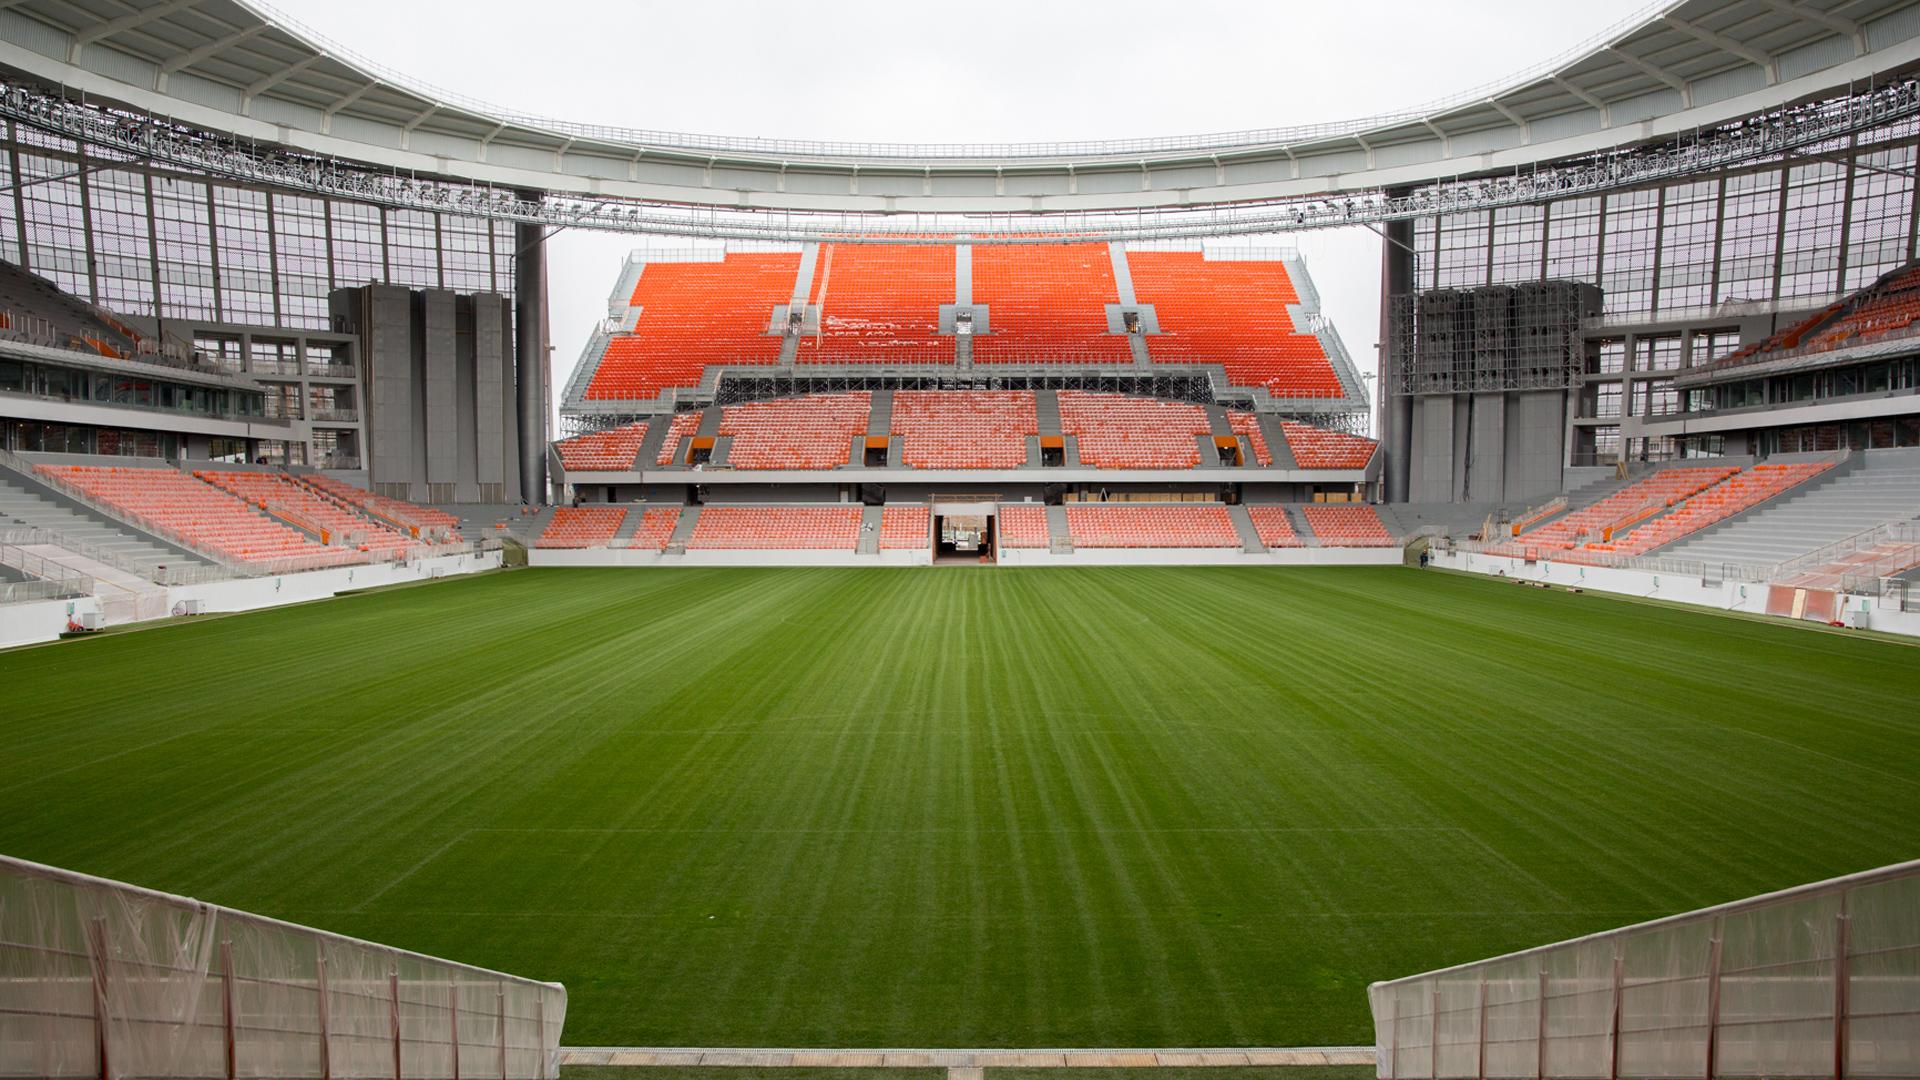 Russland Stadion Tribüne Außerhalb